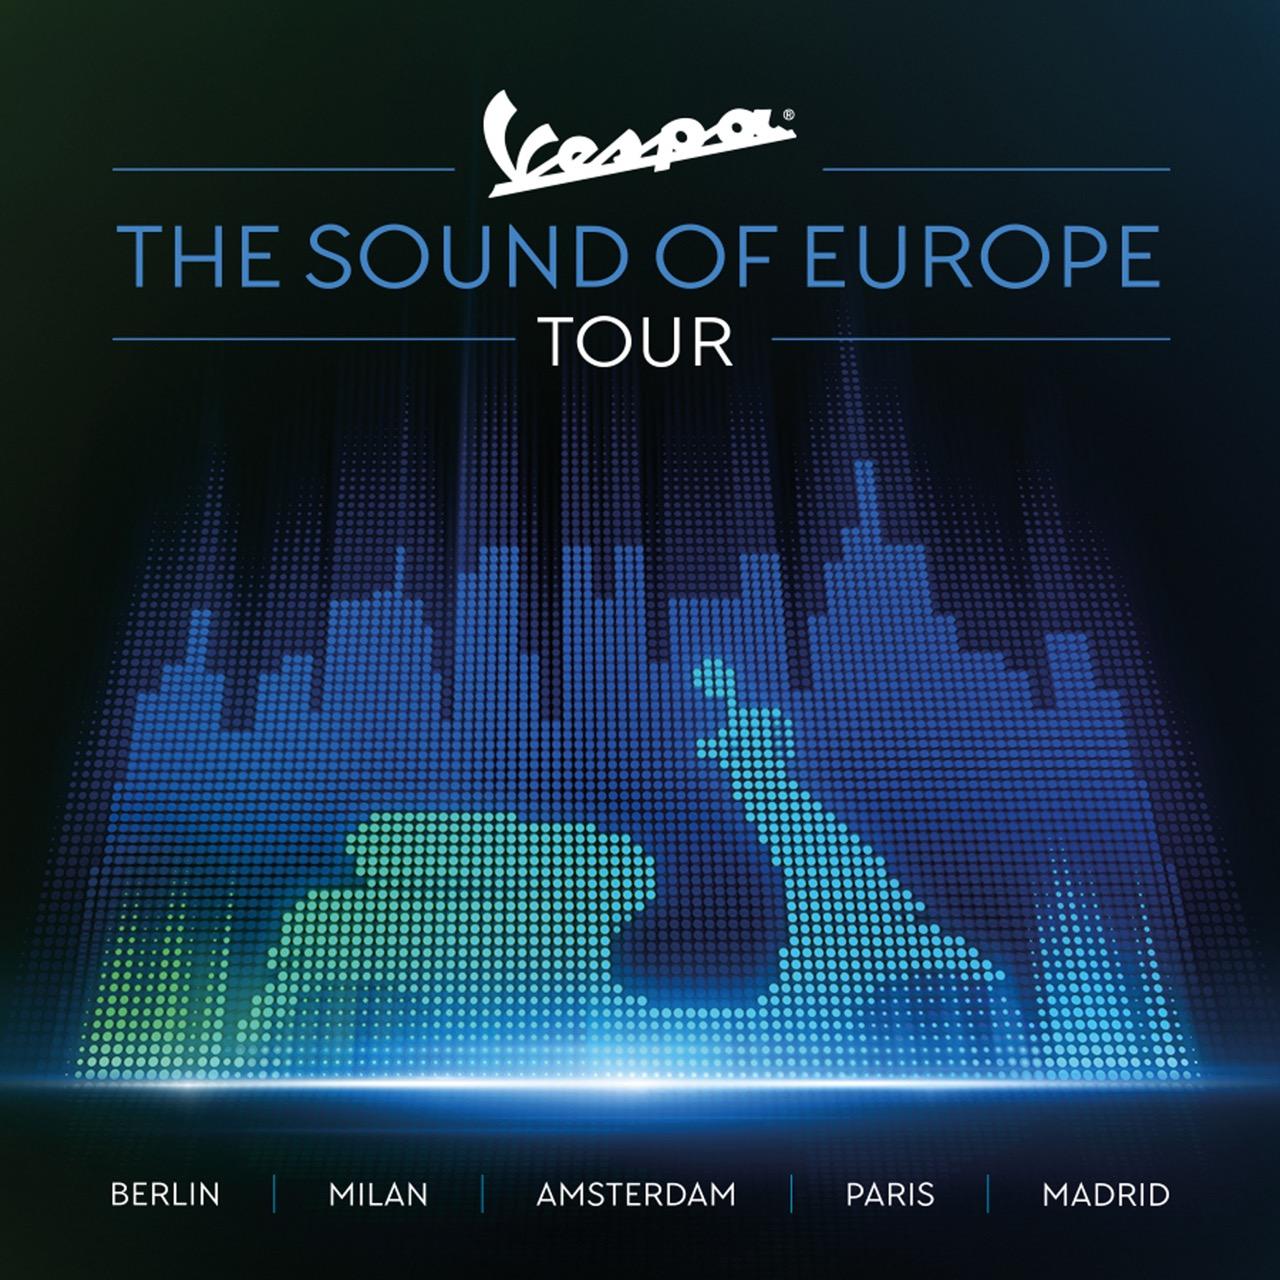 Vespa - The Sound of Europe Tour 2019